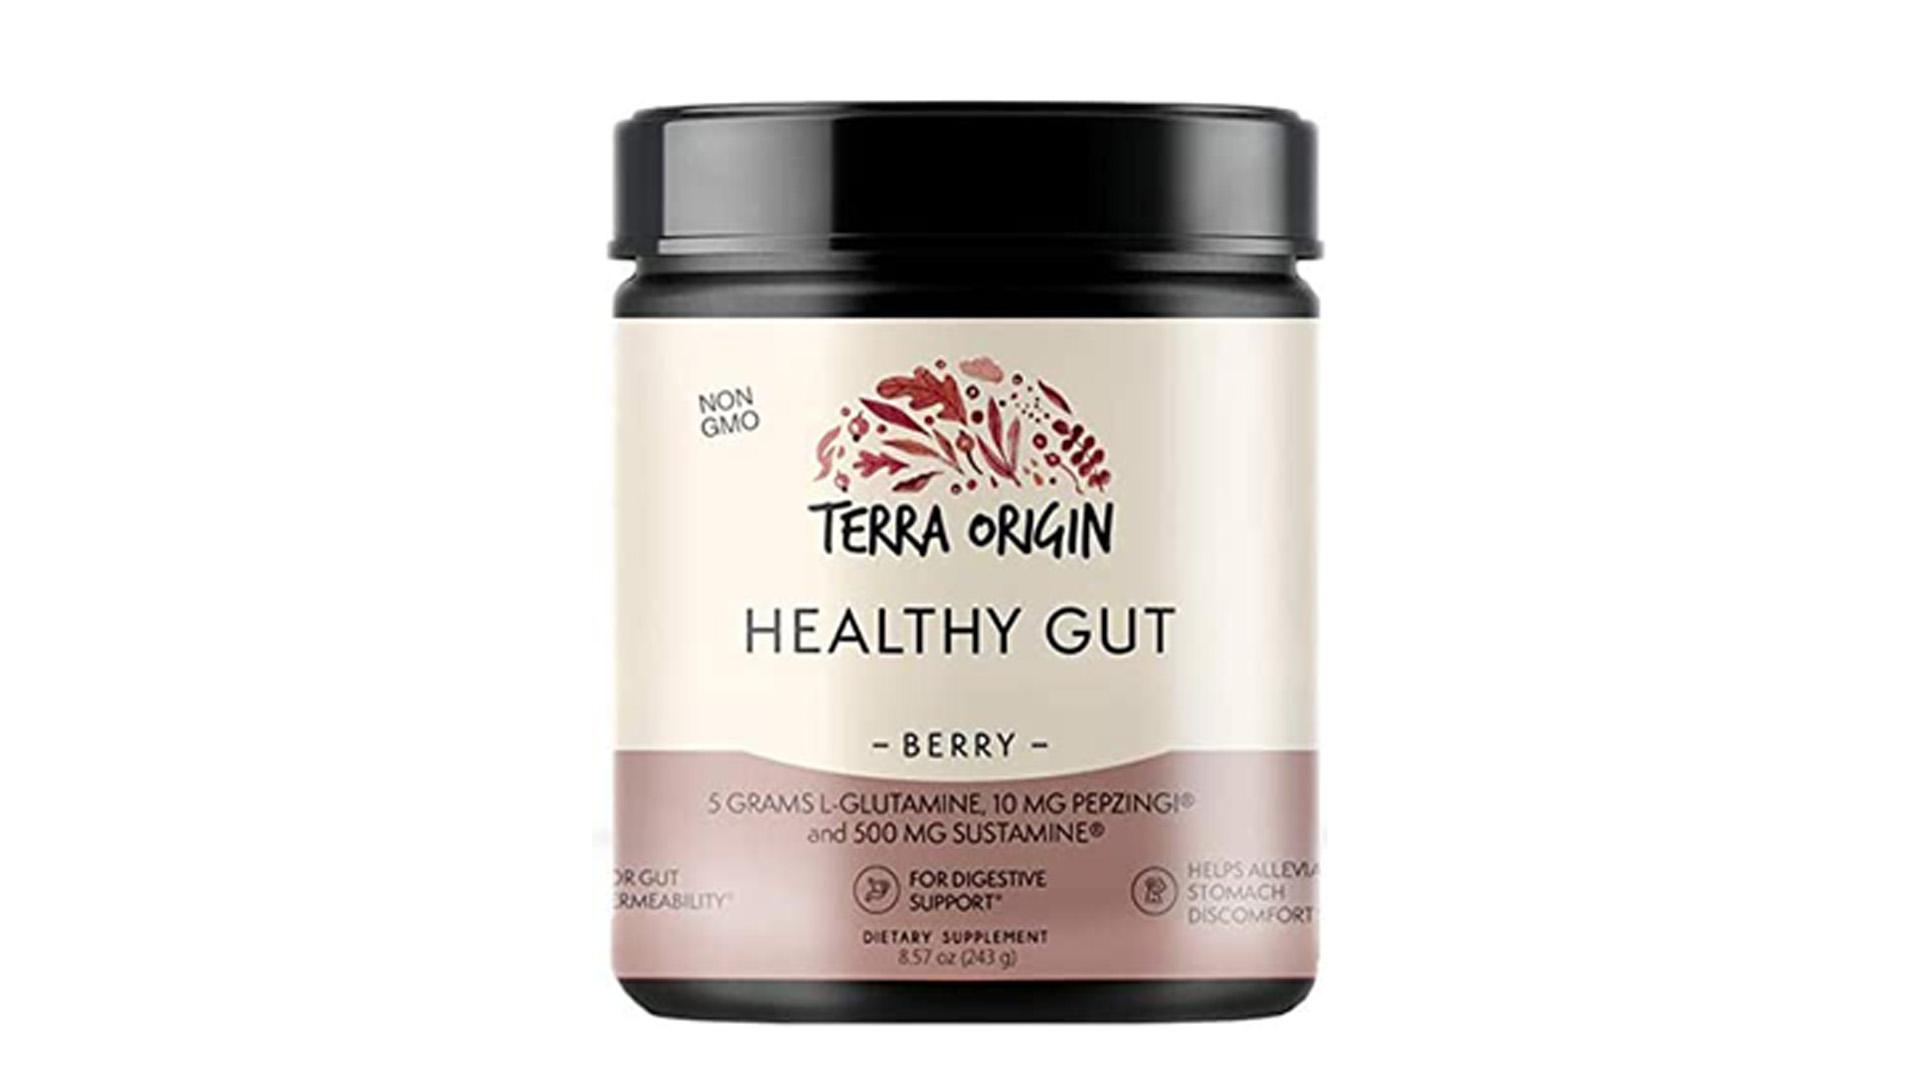 Terra Origin Healthy Gut